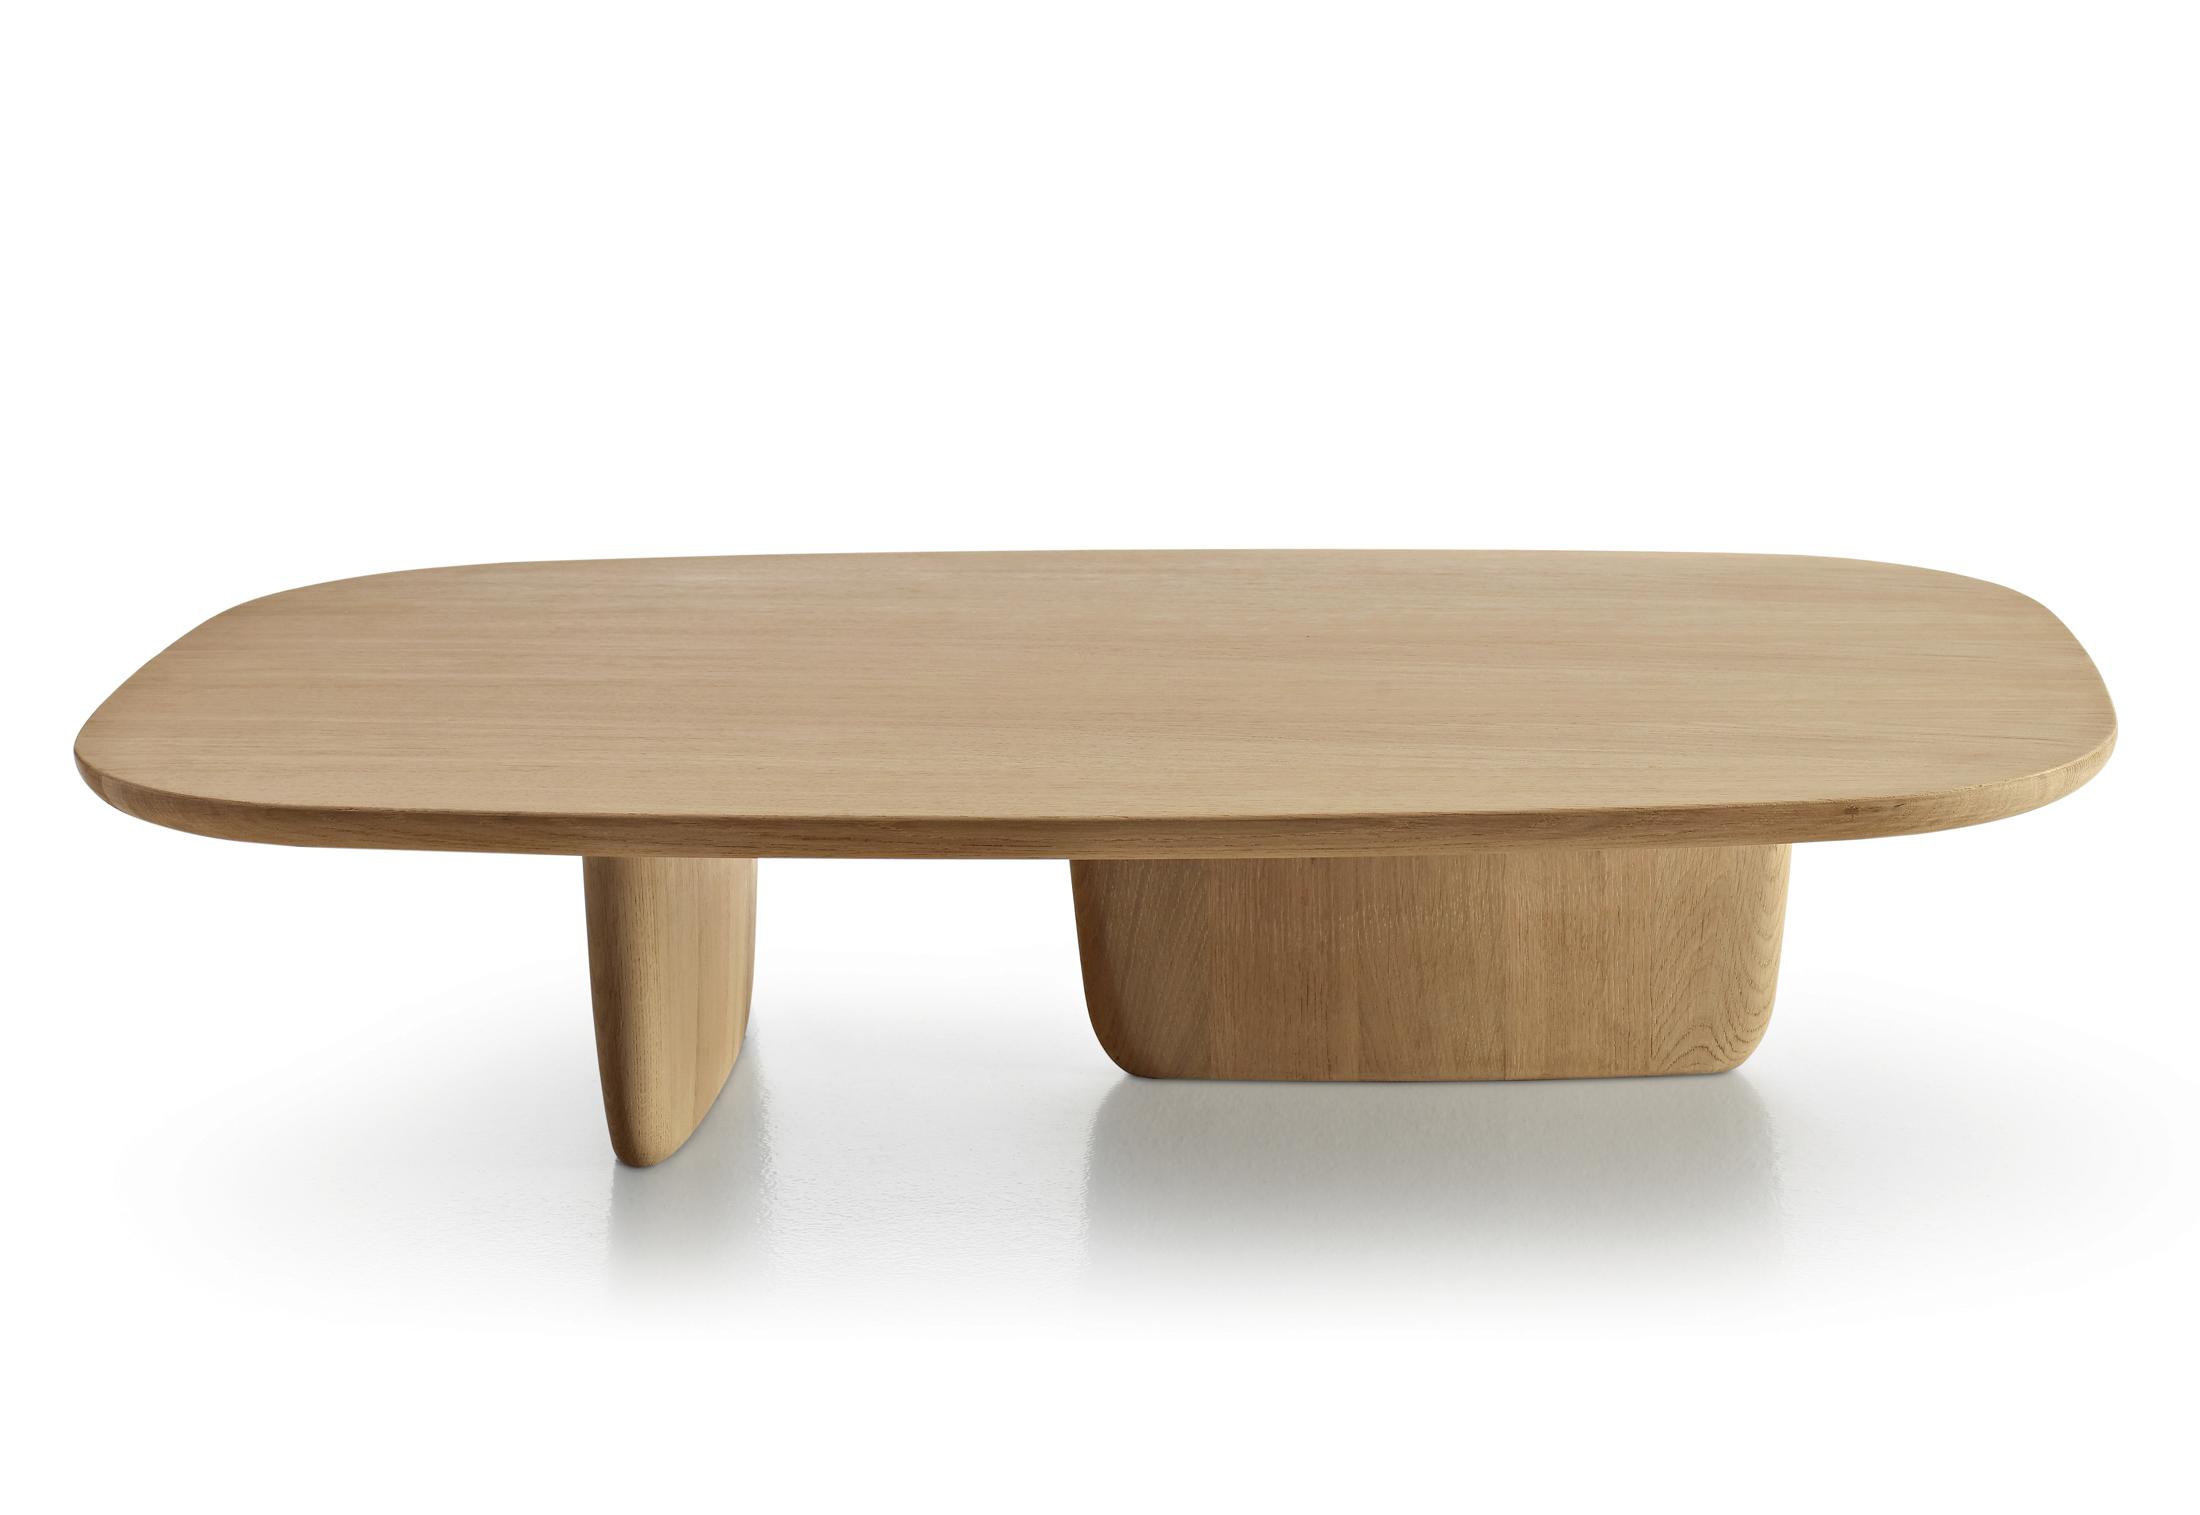 Tobi Ishi Coffee Table by B&B Italia